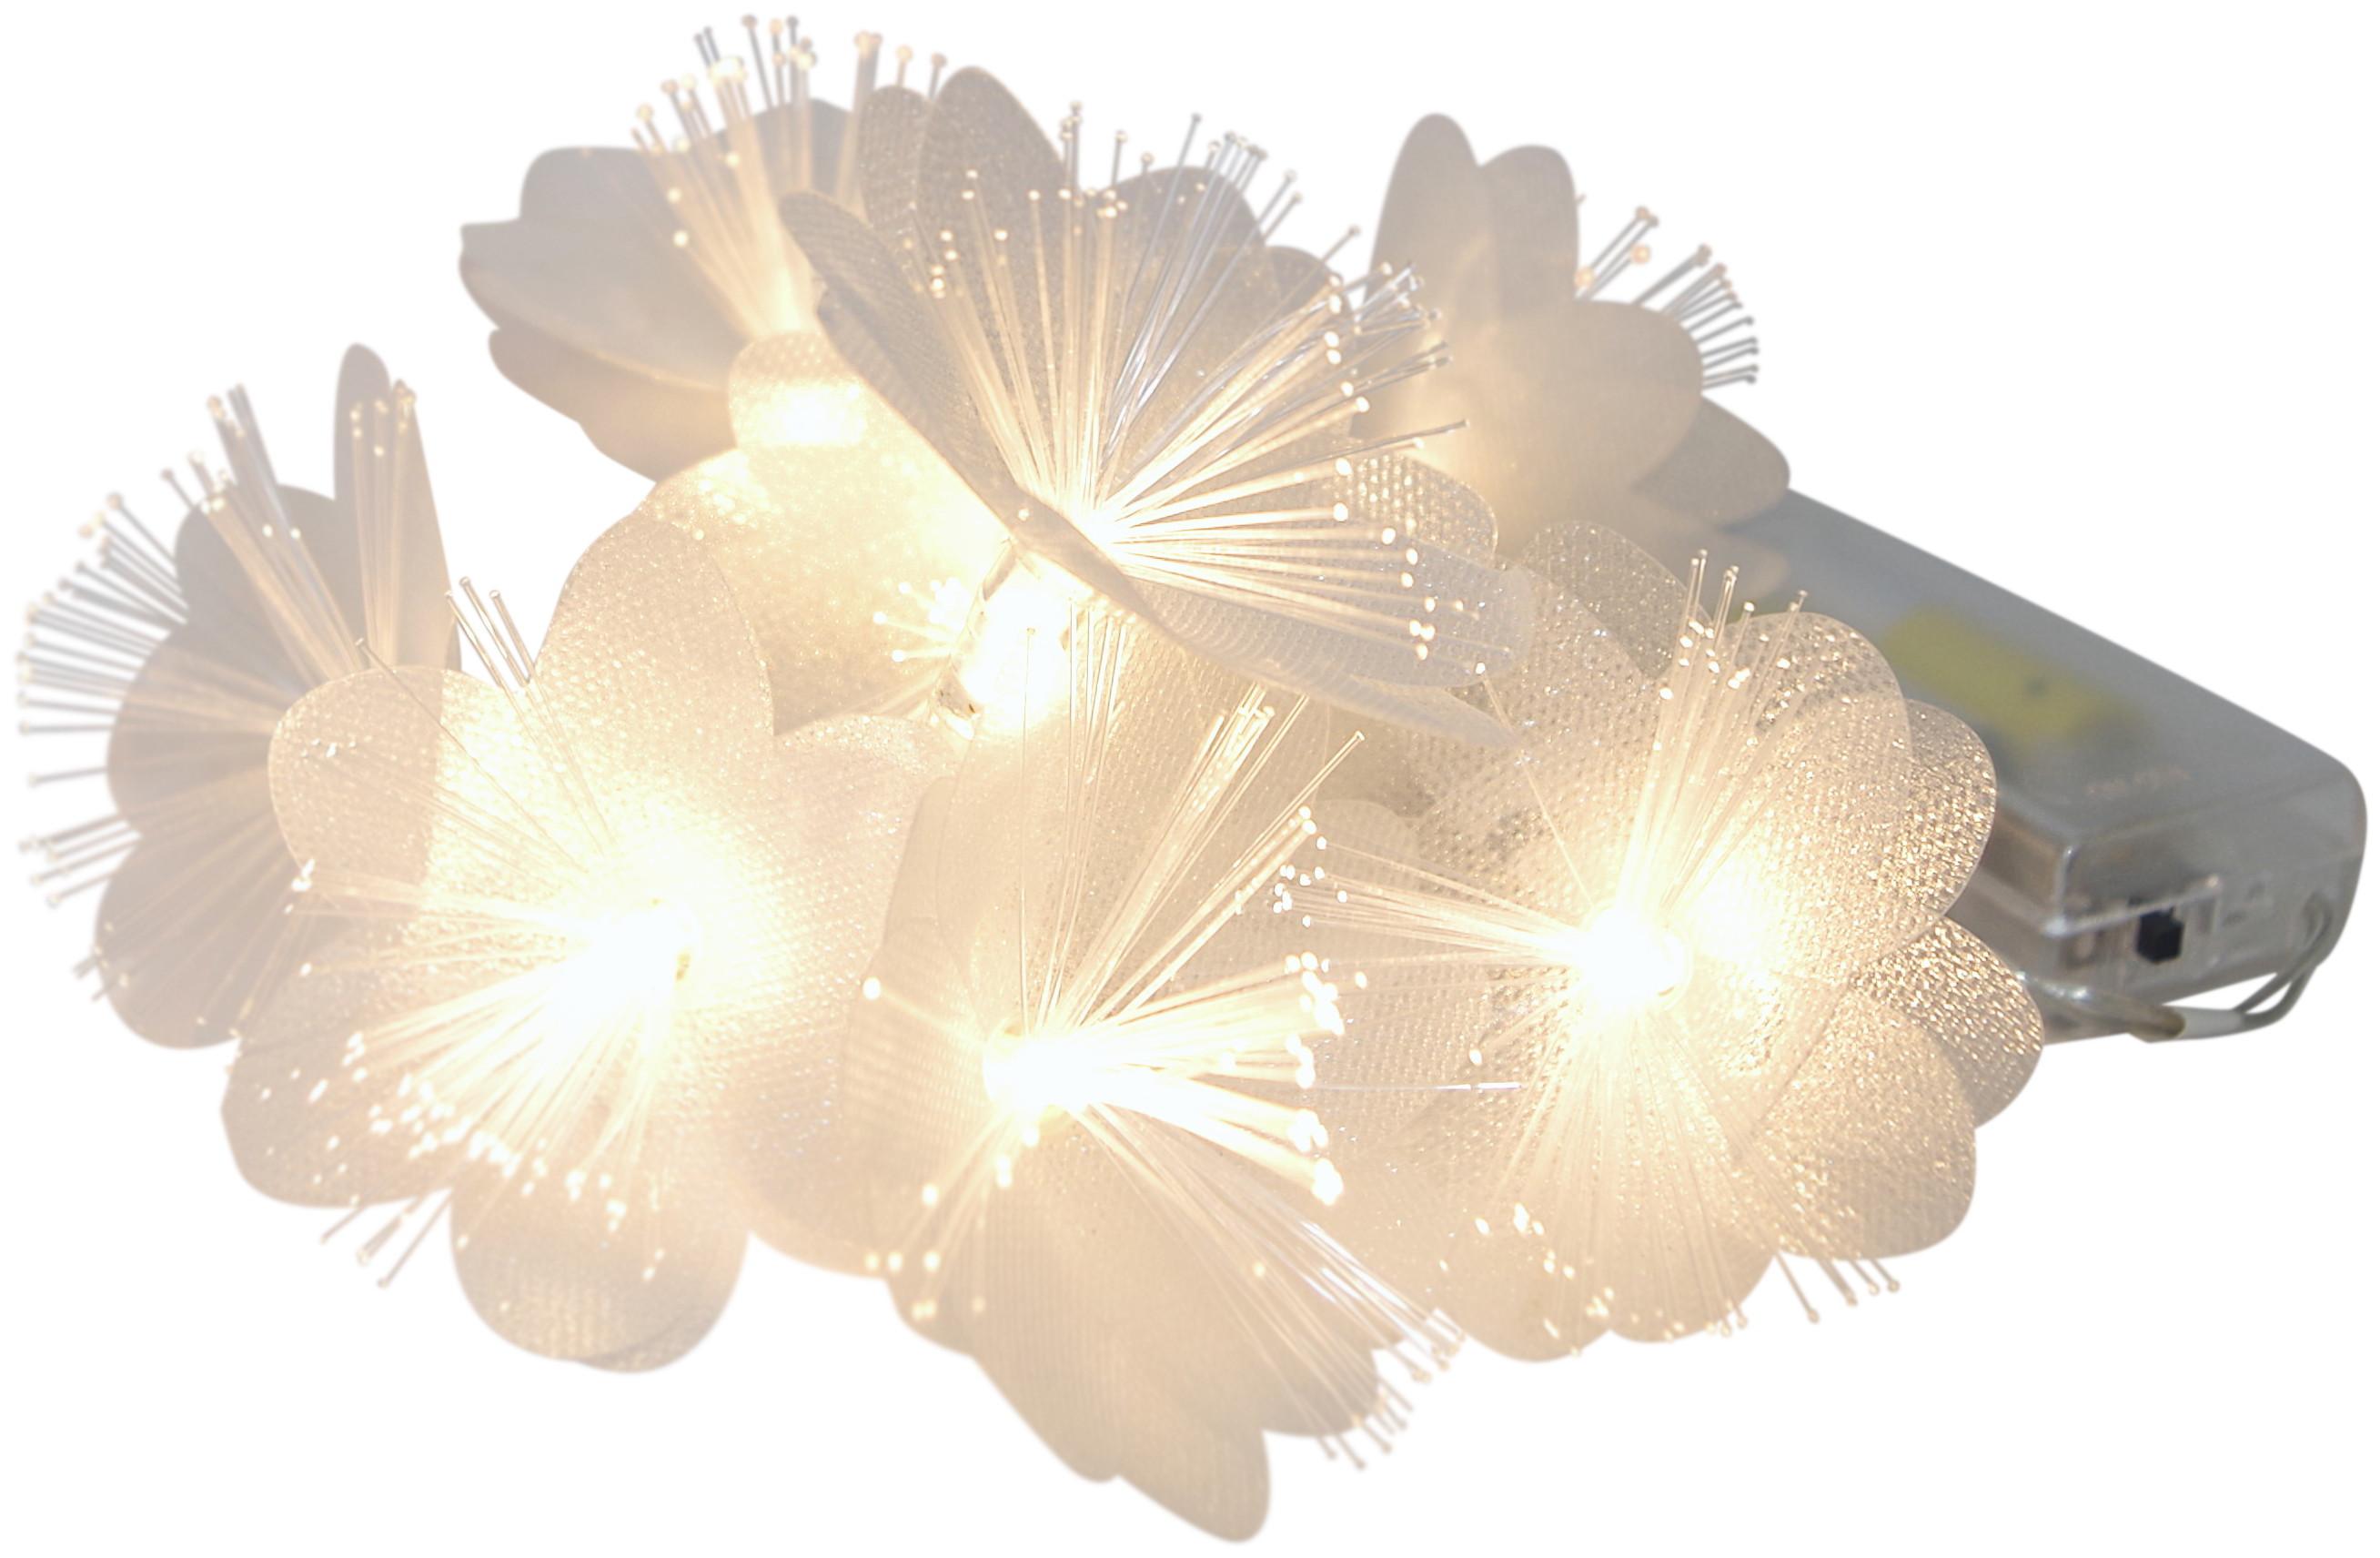 led lichterkette 8 bl ten fiberglas b schel warmwei. Black Bedroom Furniture Sets. Home Design Ideas